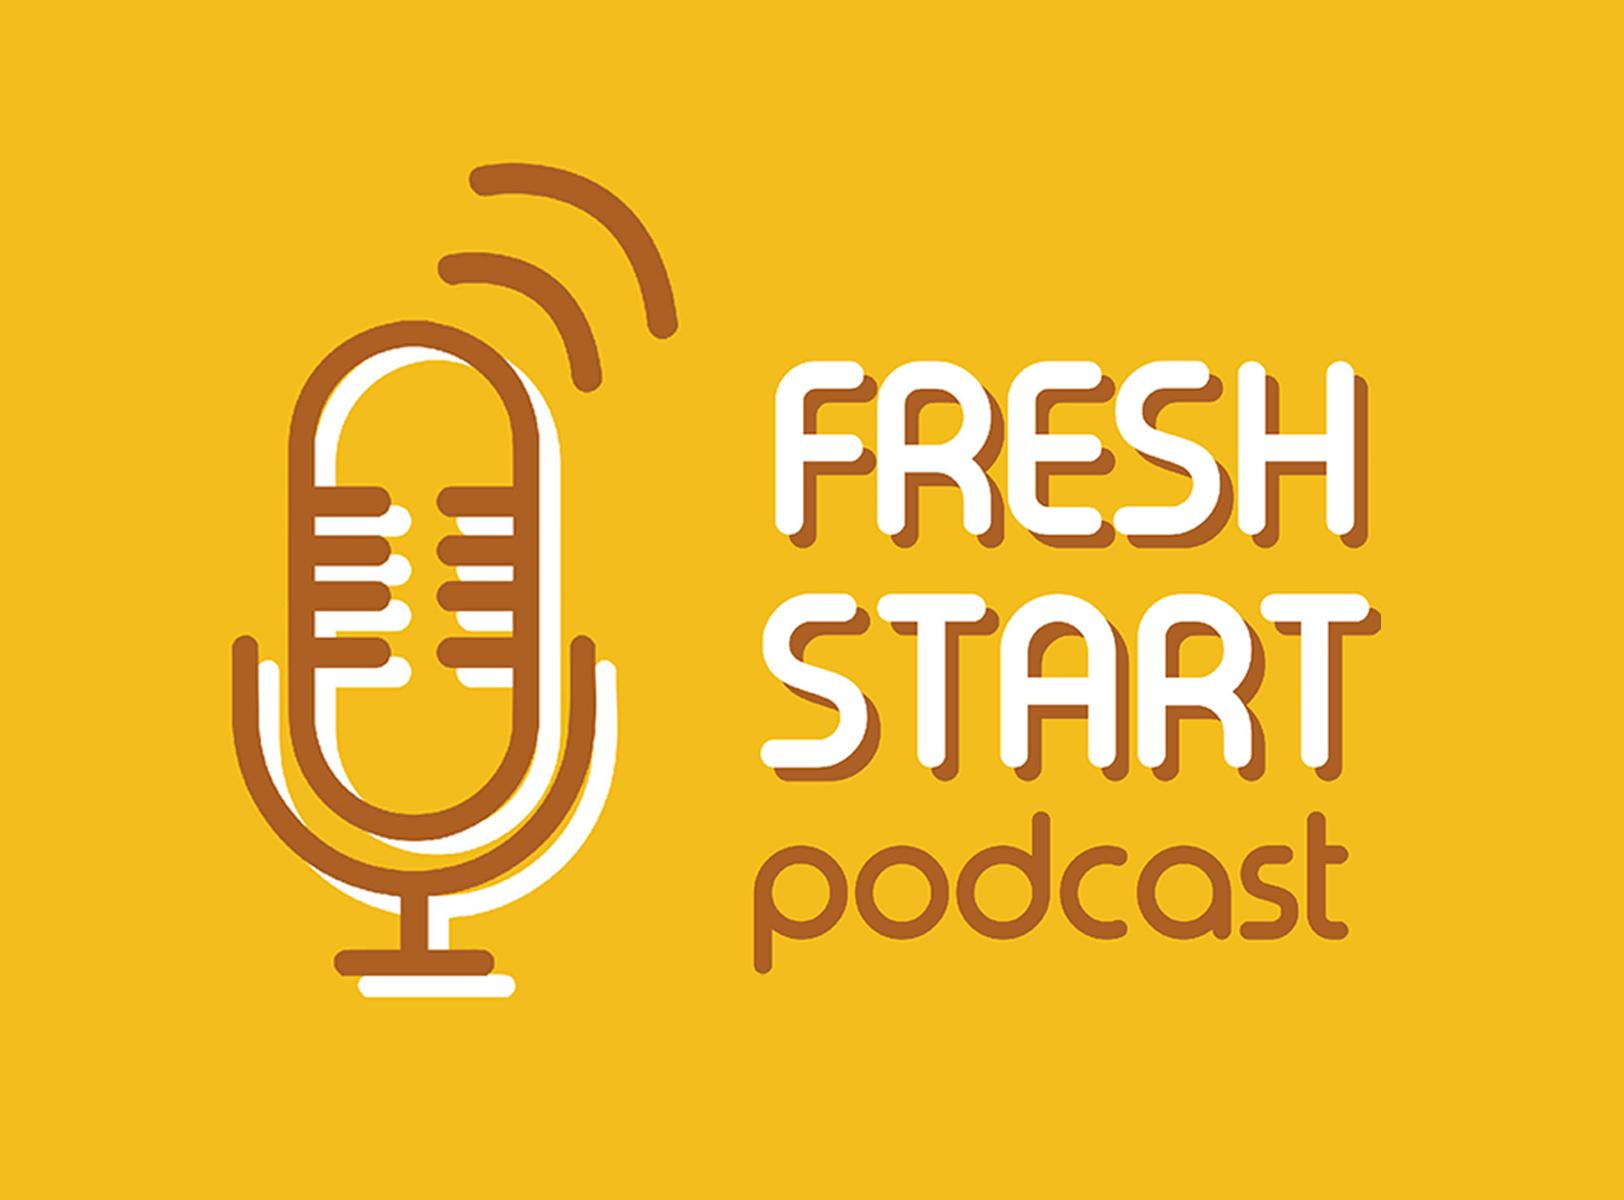 Fresh Start: Podcast News (7/16/2018 Mon.)